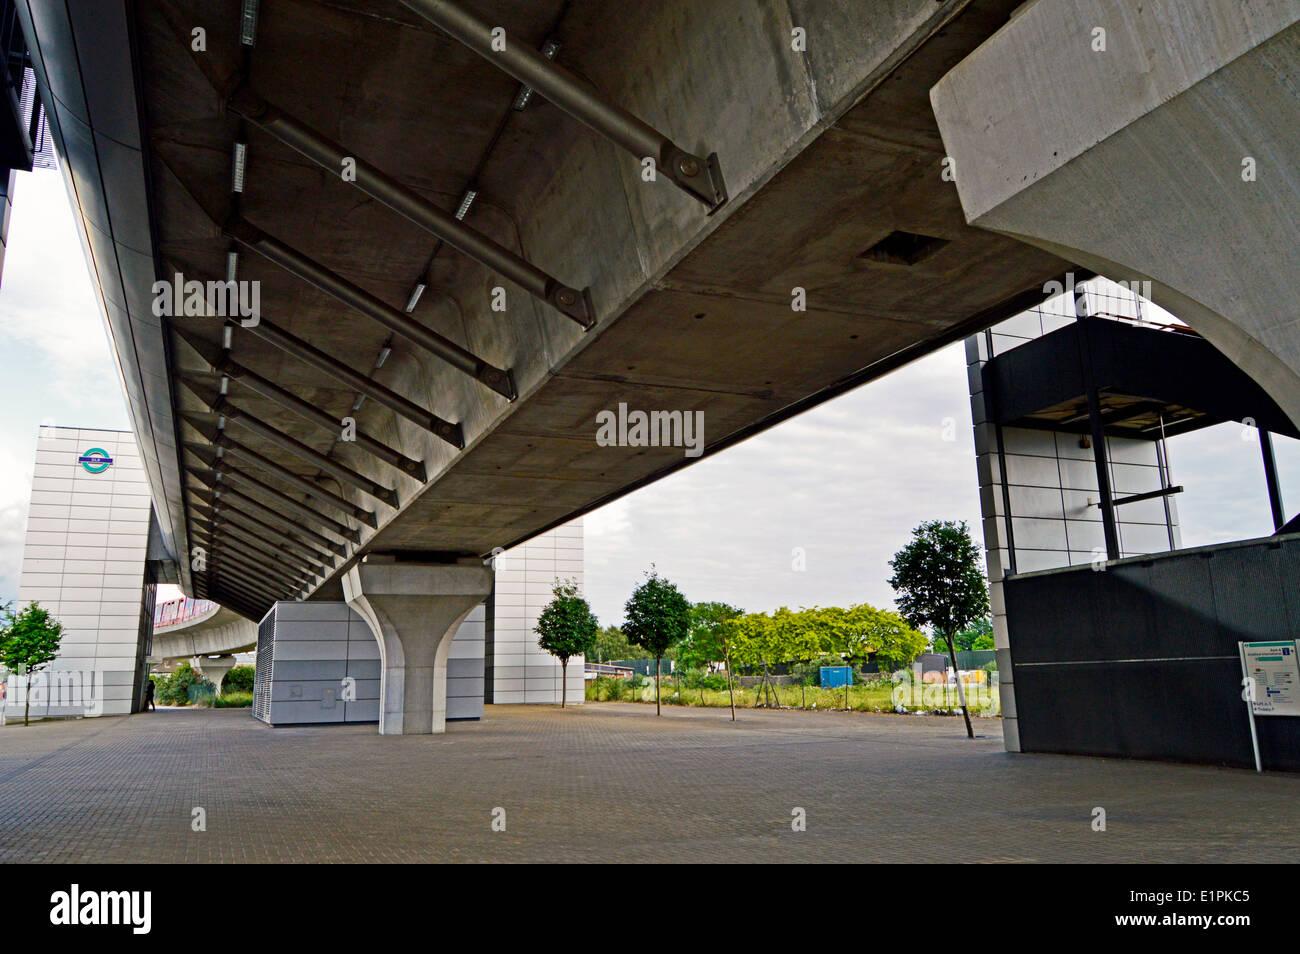 West Silvertown DLR Station, London Borough of Newham, London, England, United Kingdom - Stock Image